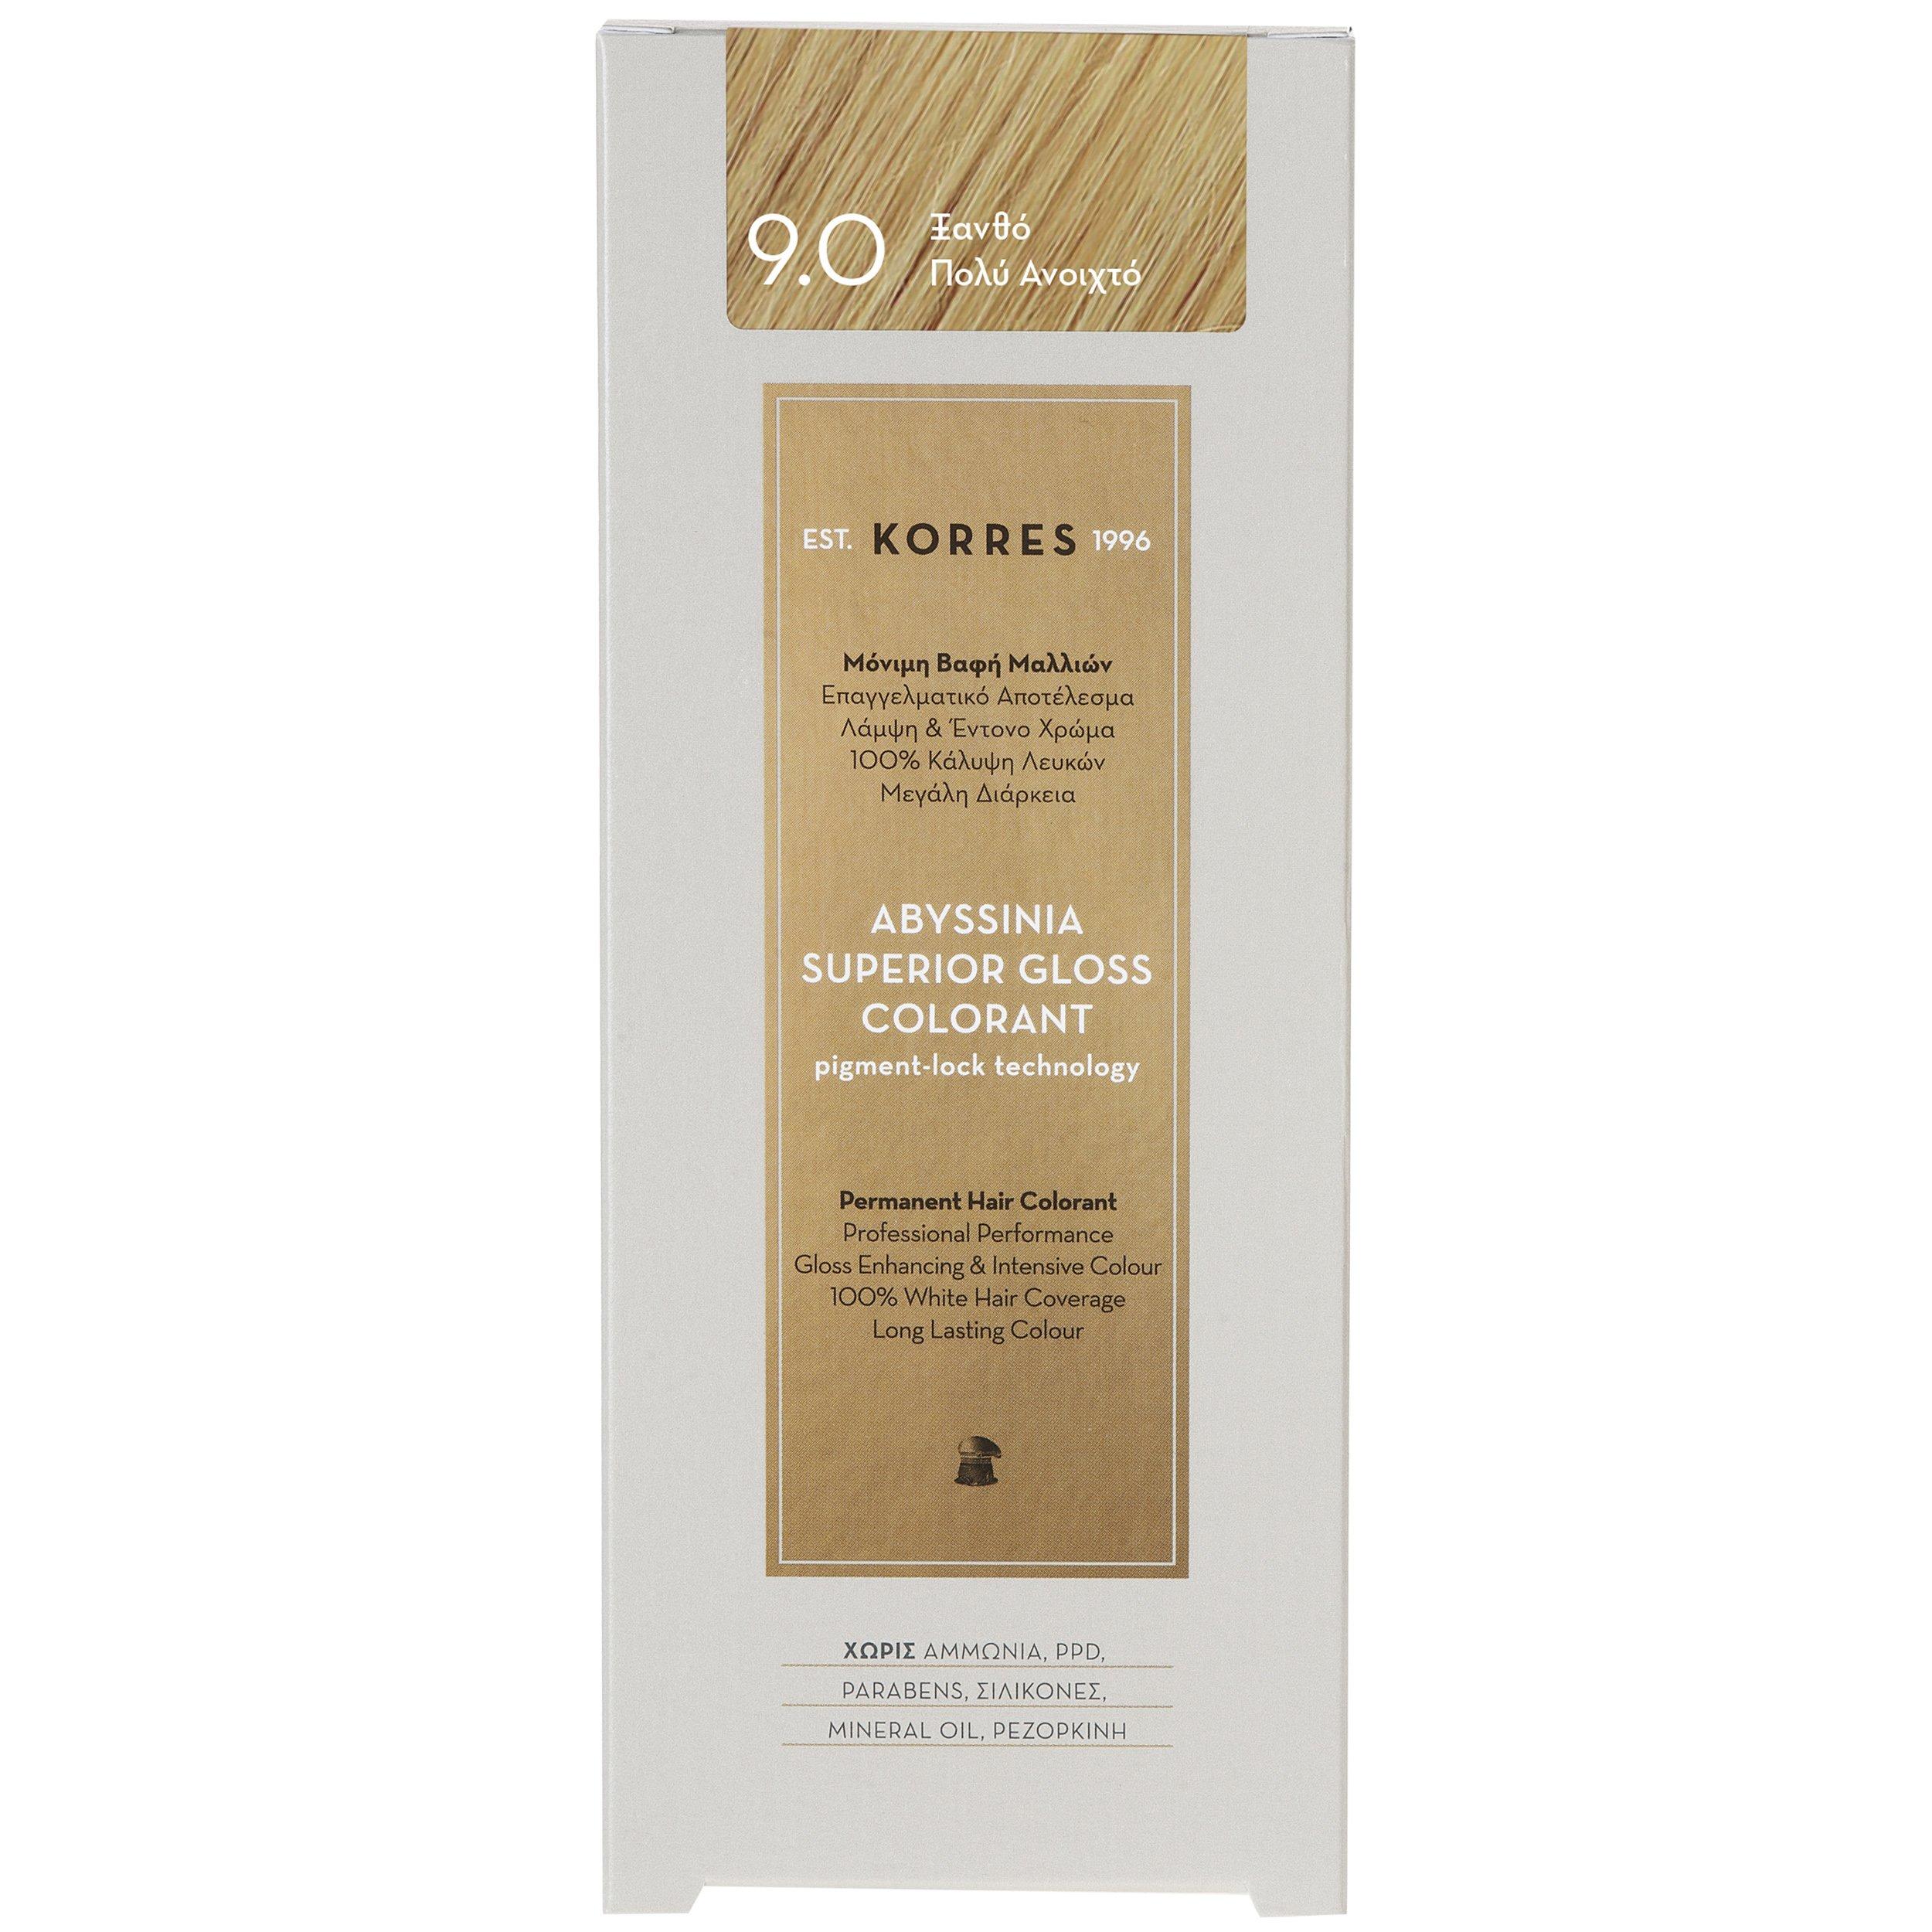 Korres Abyssinia Superior Gloss Colorant Επαγγελματικό Αποτέλεσμα Λάμψη & Έντονο Χρώμα – 9.0 ΞΑΝΘΟ ΠΟΛΎ ΑΝΟΙΚΤΟ